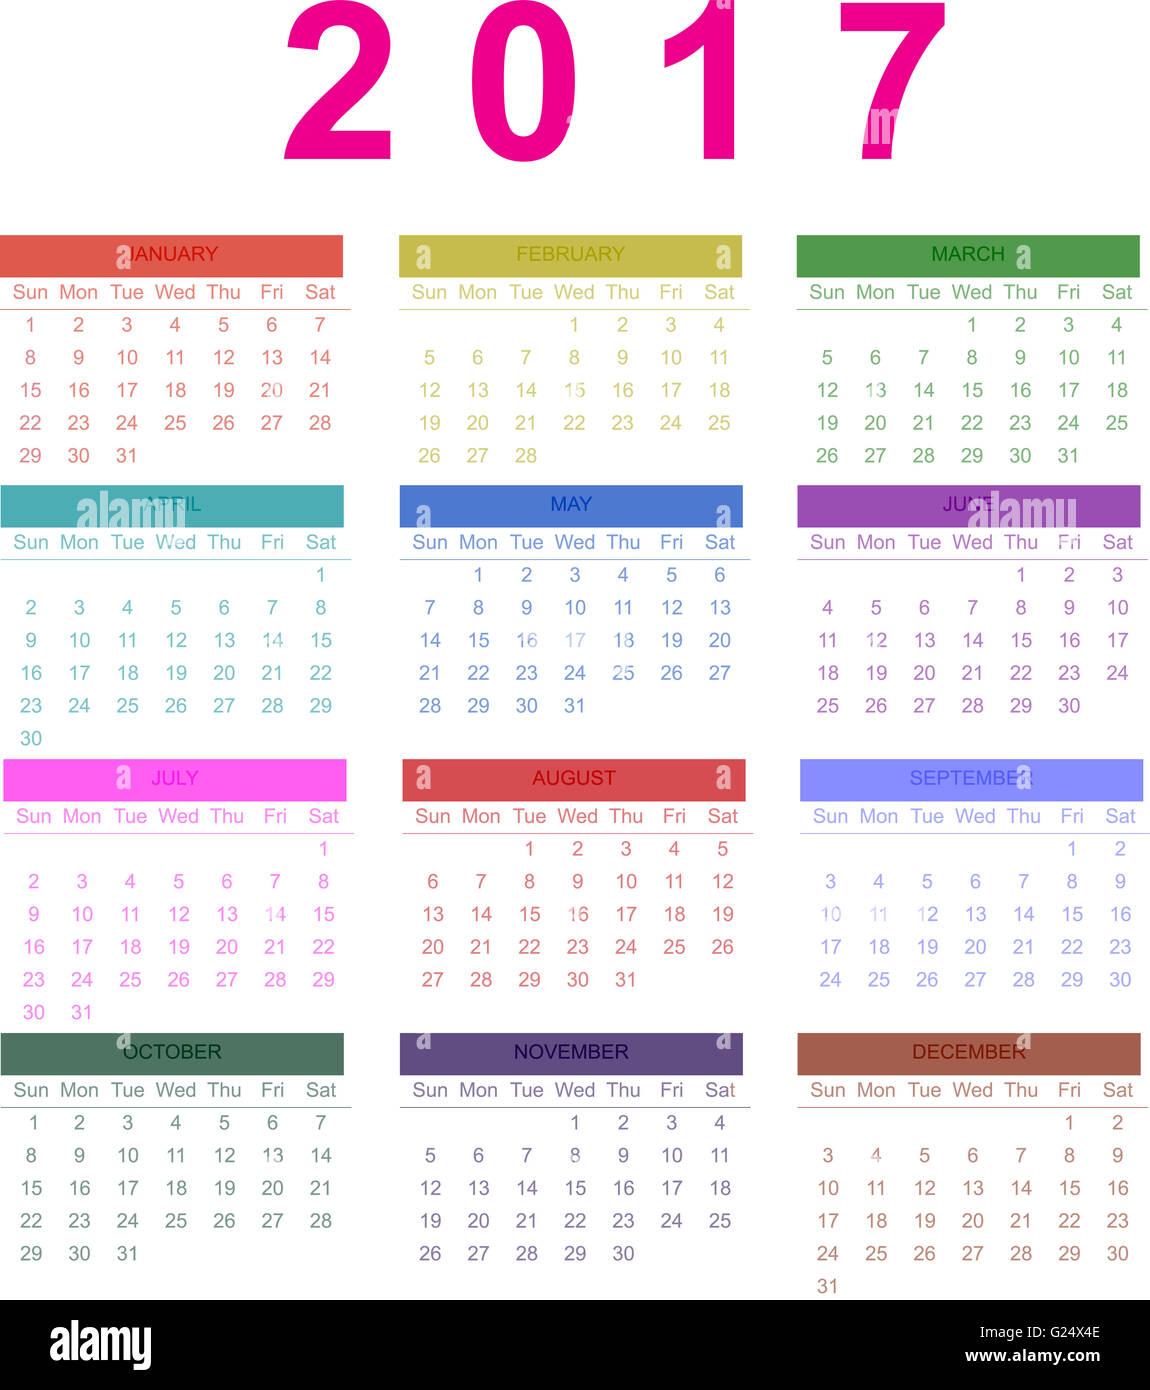 calendar 2017 monthly calendar of 2017 stock photo 104599838 alamy